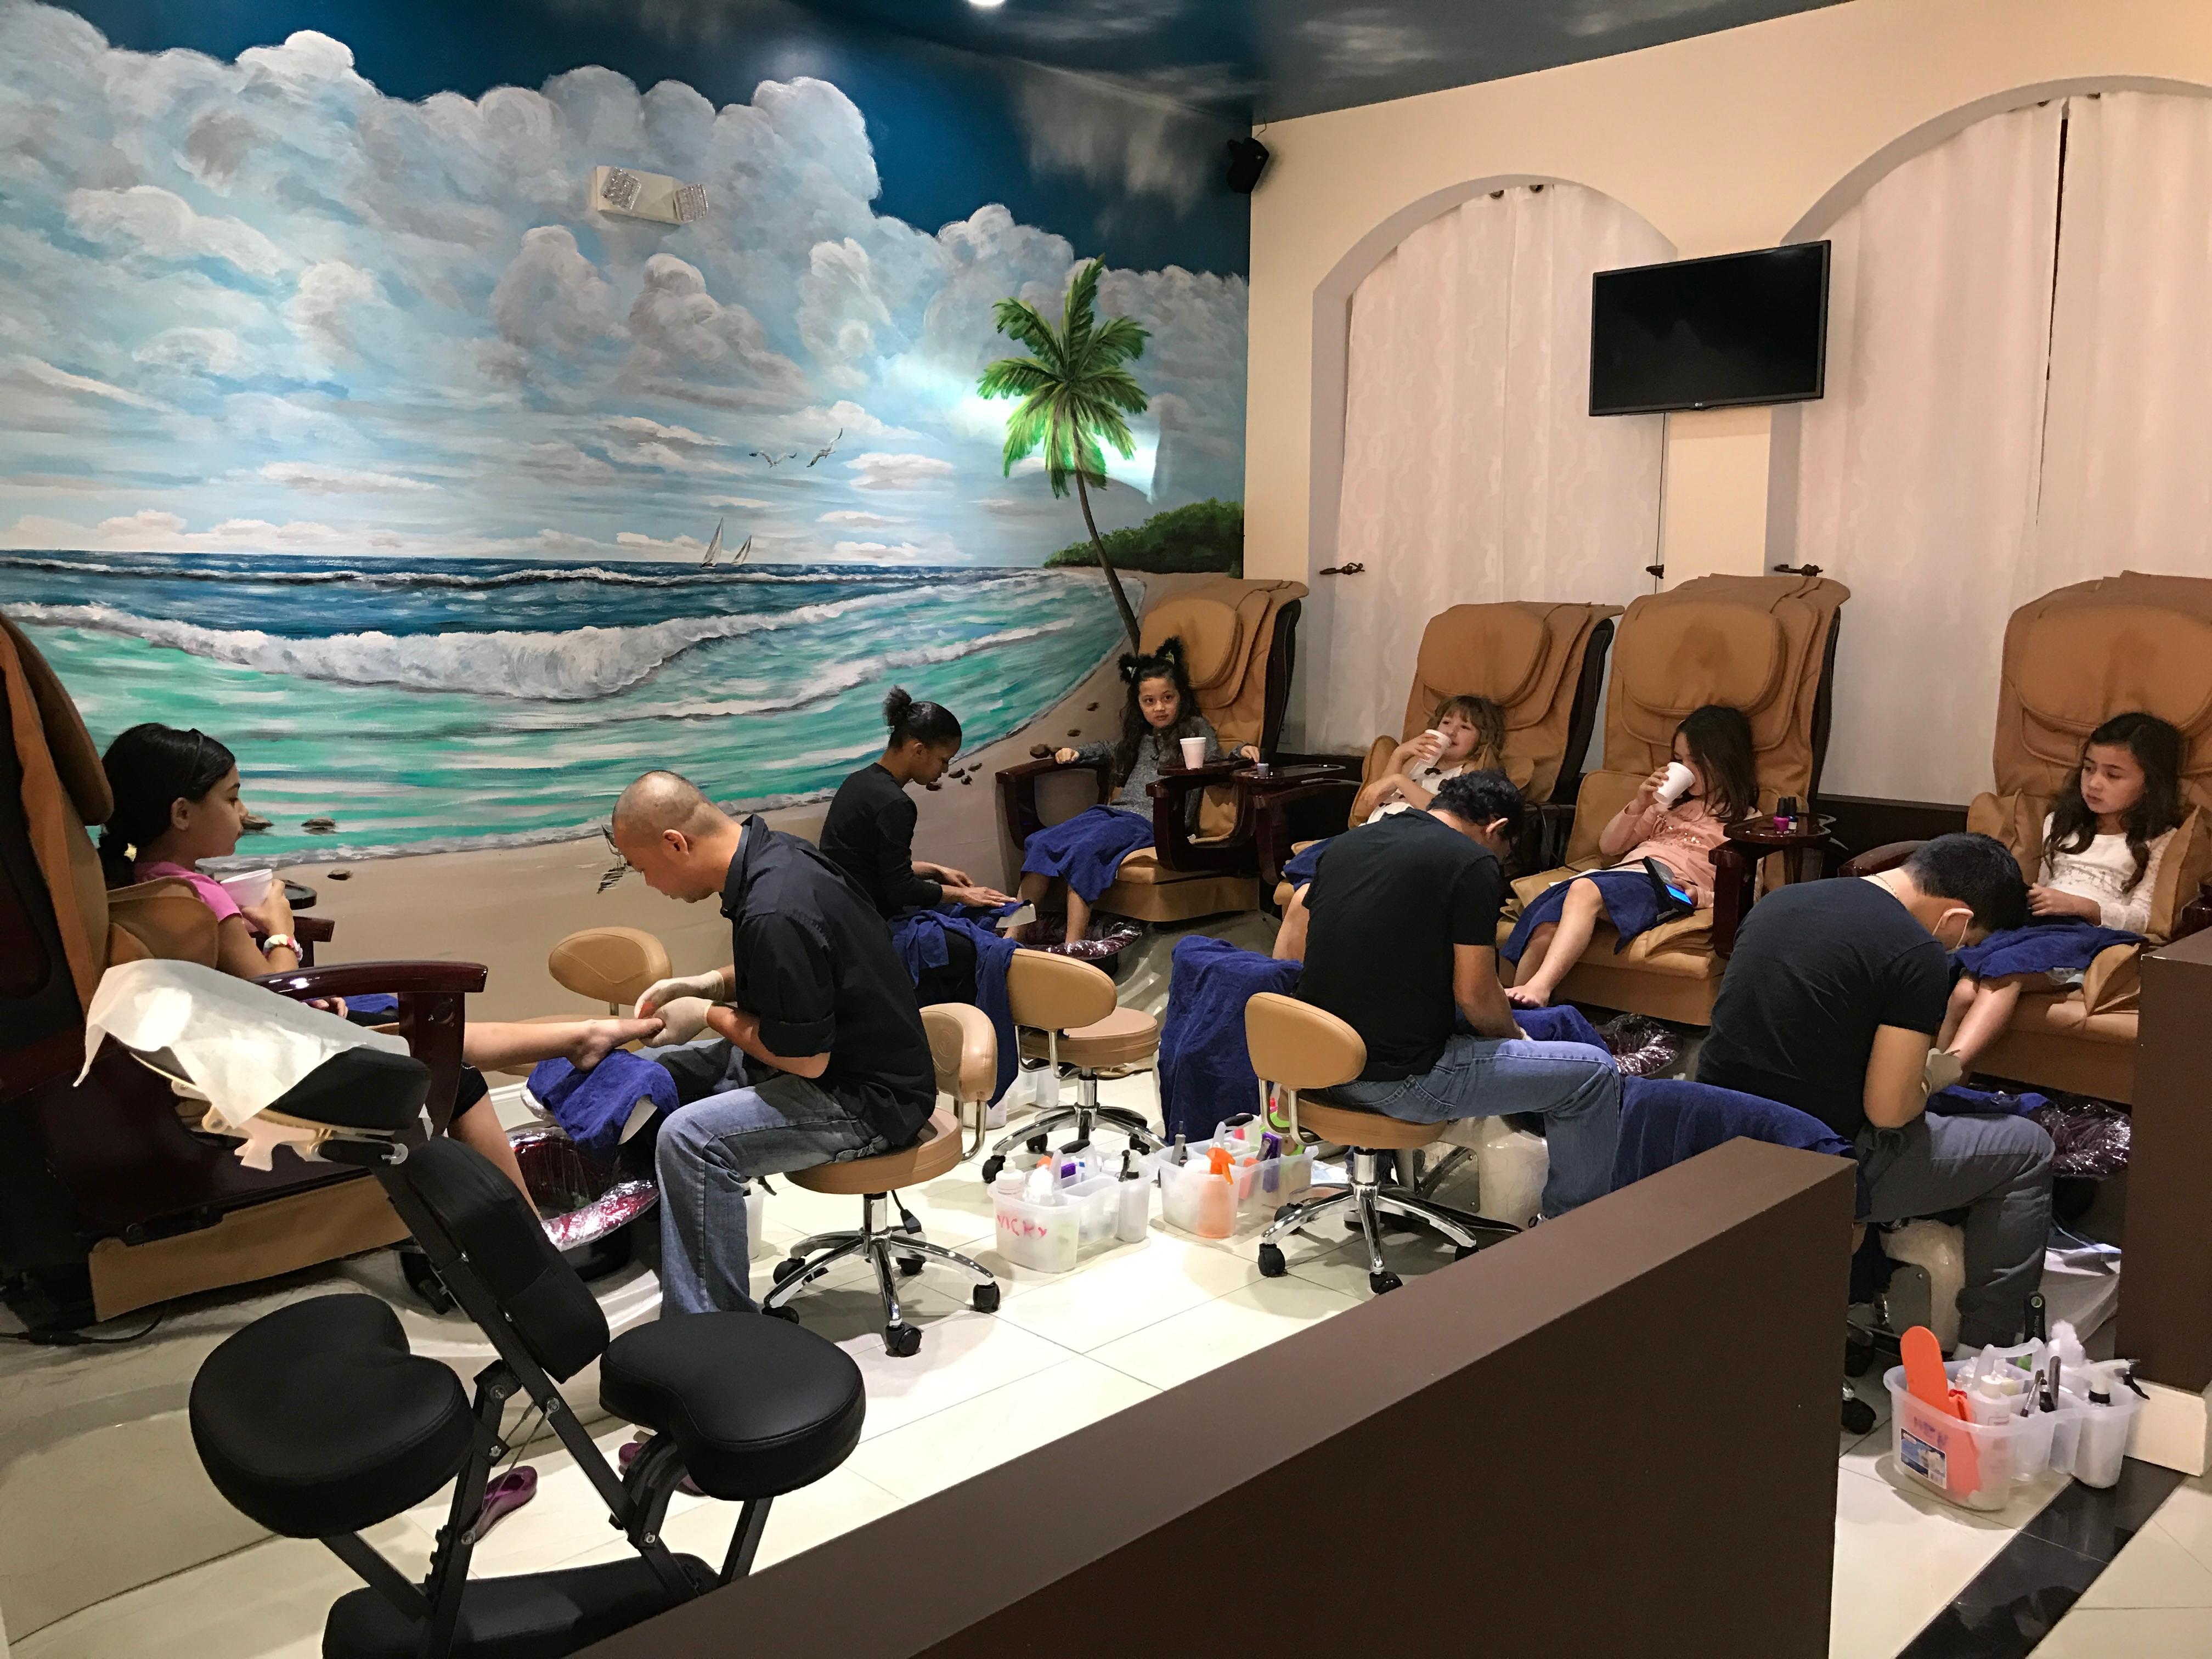 Best Nail Salon In Pompano Beach